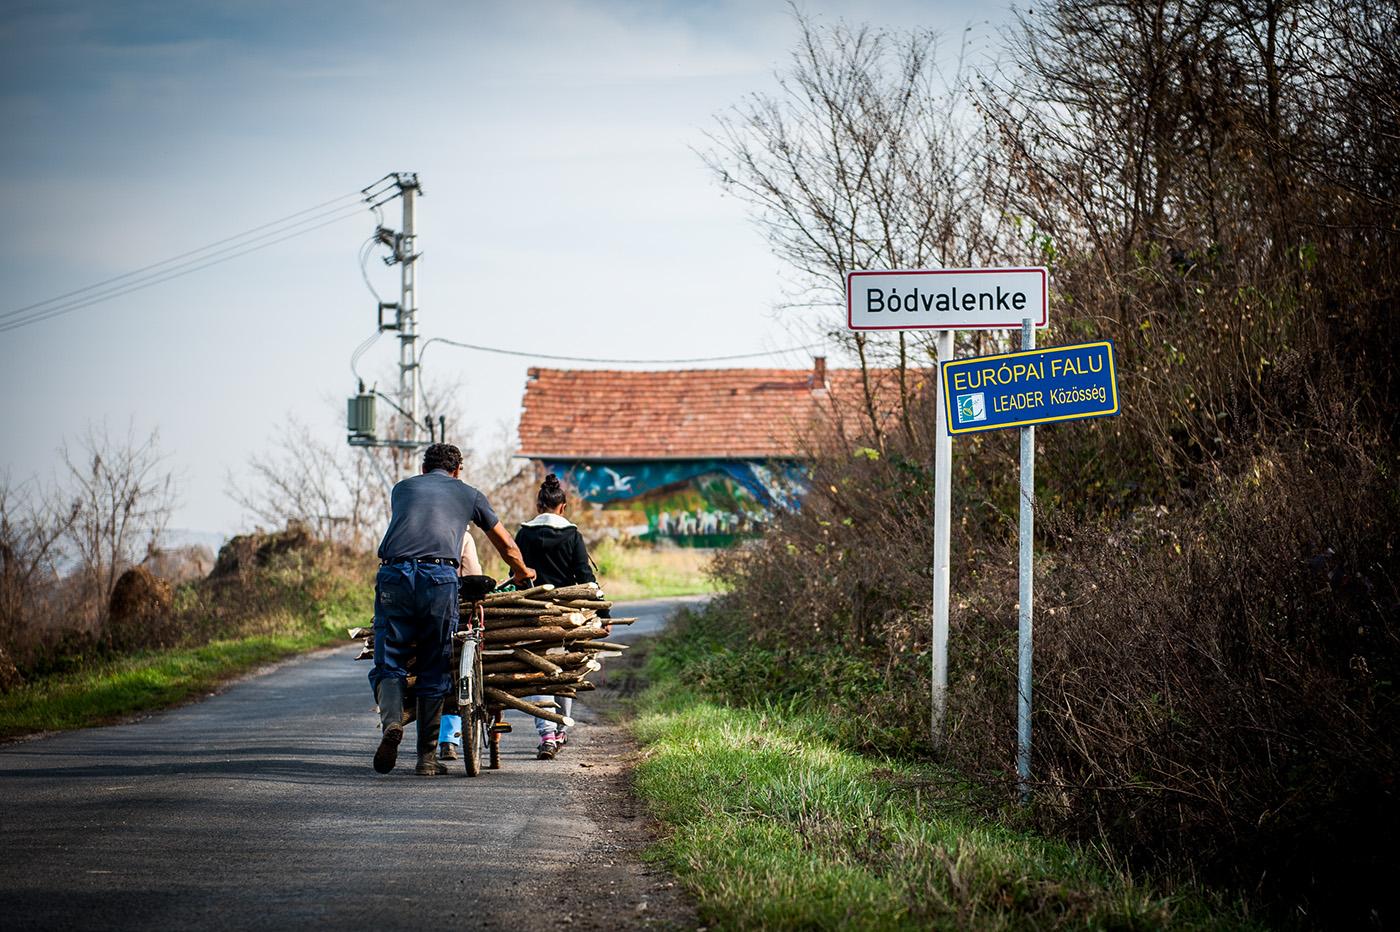 Poverty poor village people social